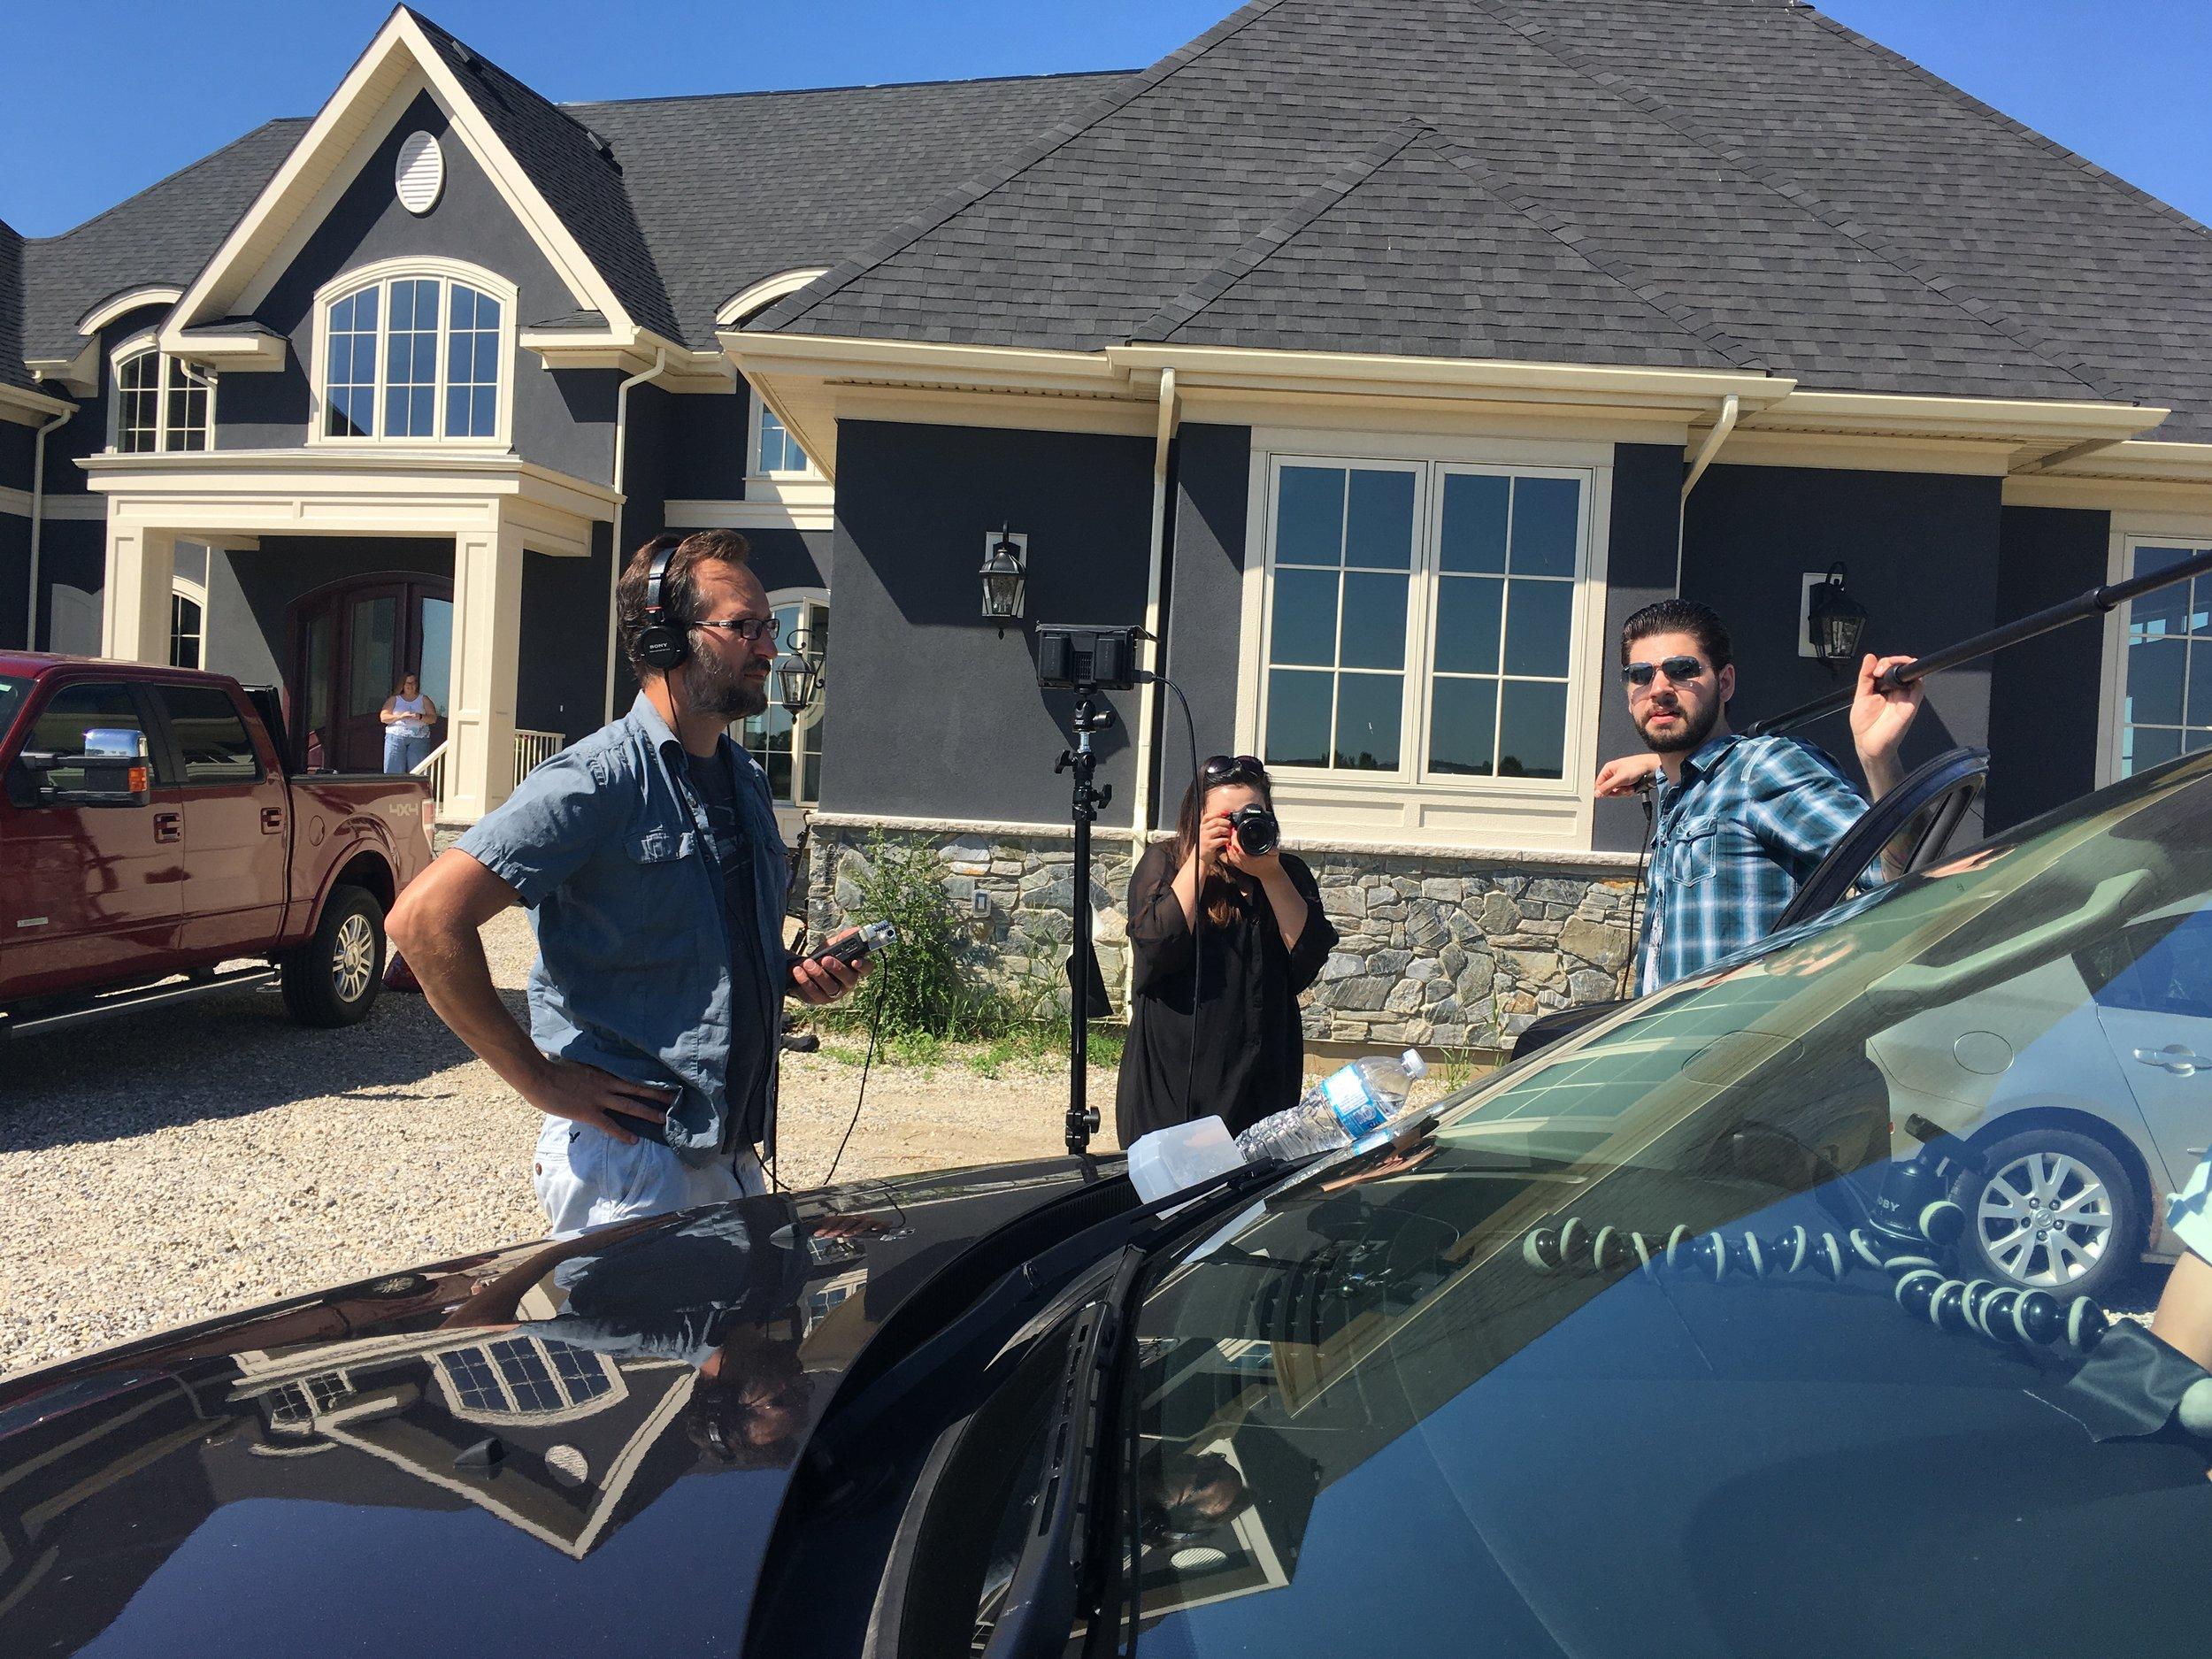 McSweeney's-commercial-2017-car.jpg